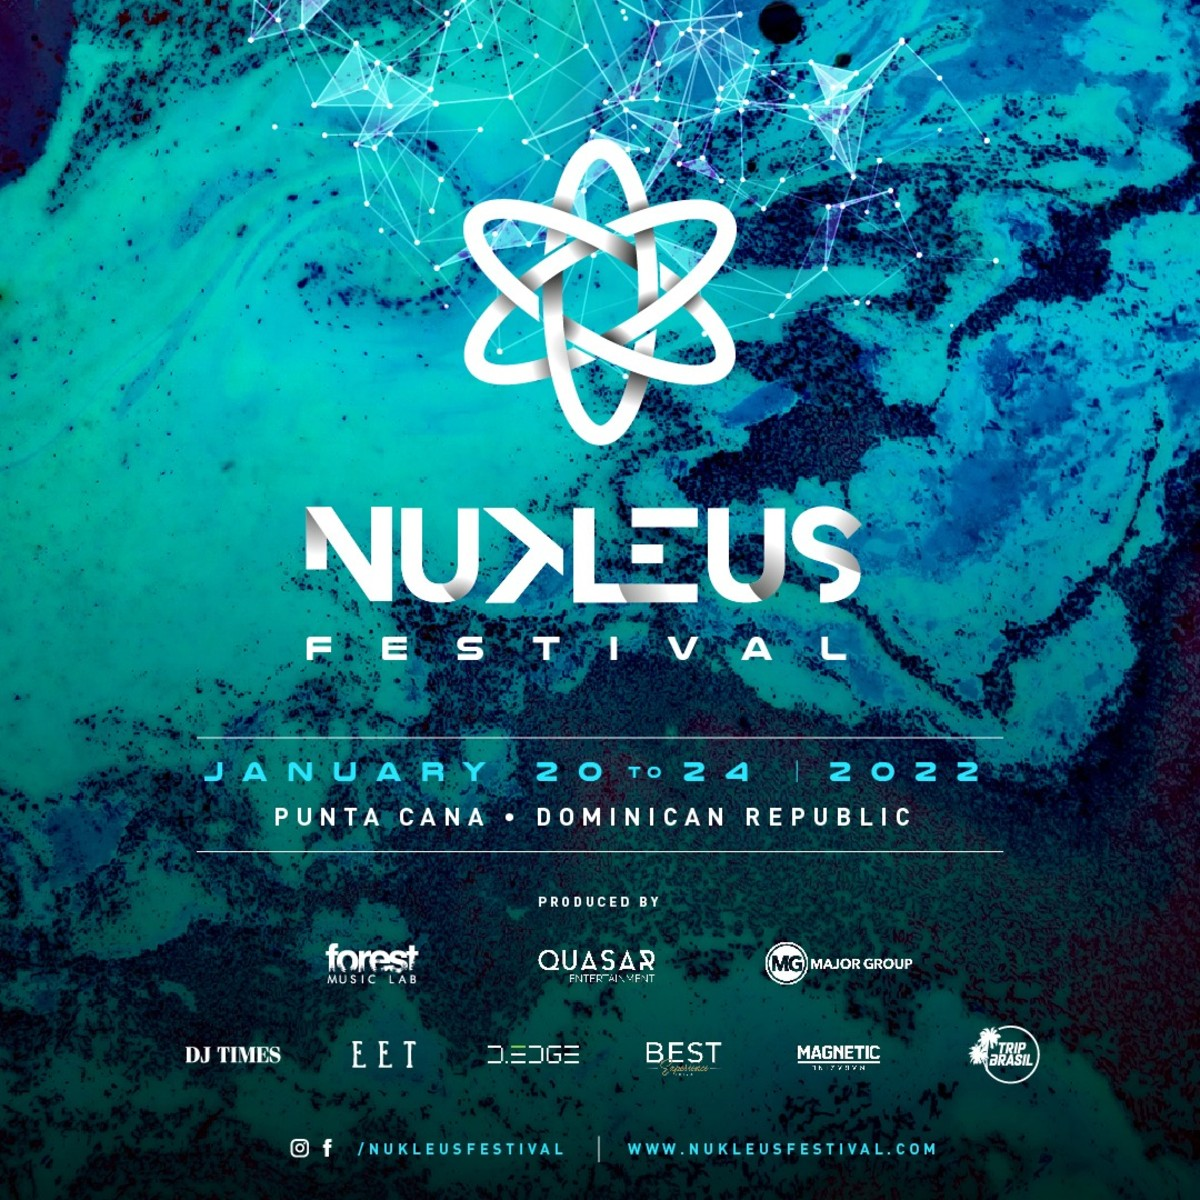 nukleus festival artwork